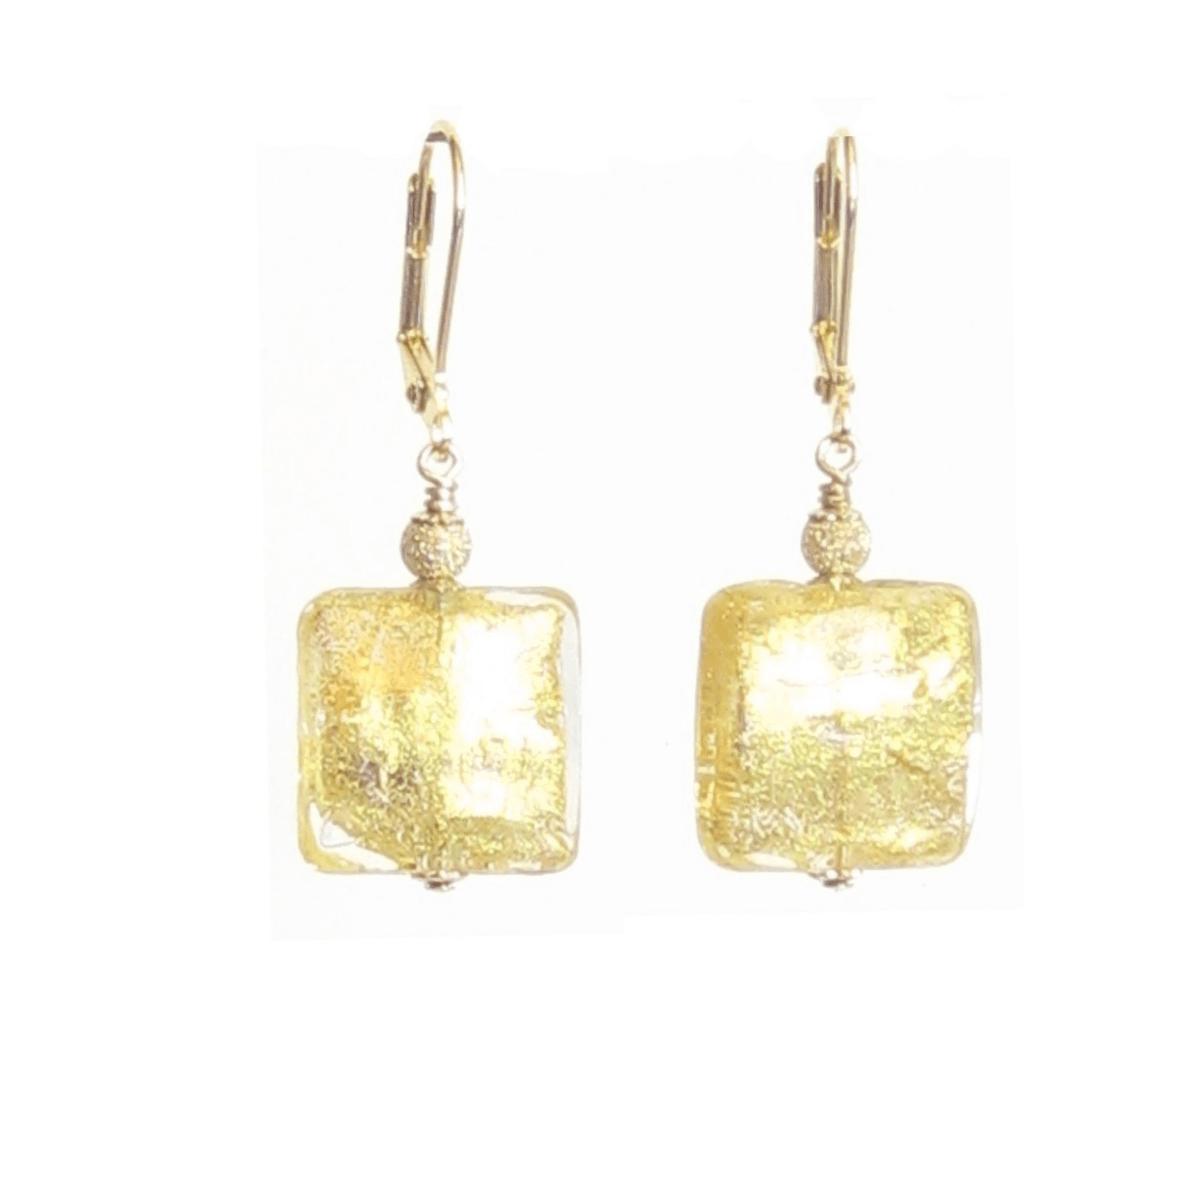 Murano Glass Square Clear Gold Earrings  #jewelry #etsymntt #earrings #handmade #murano #fashion